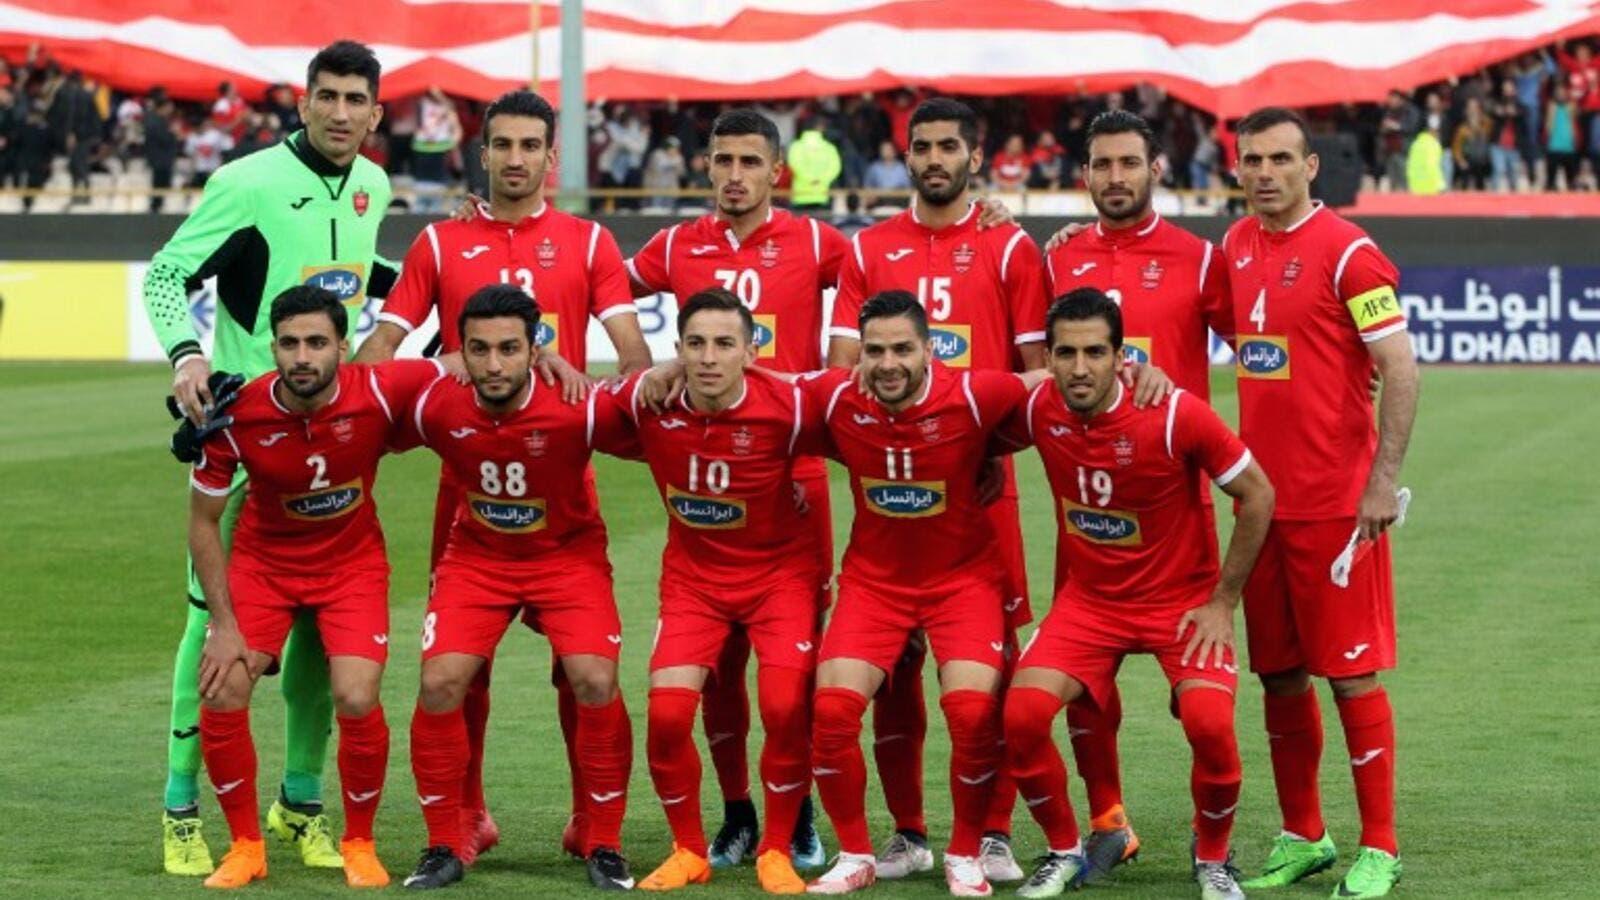 962e54120 Persepolis Wins Iran s Persian Gulf Pro League Title